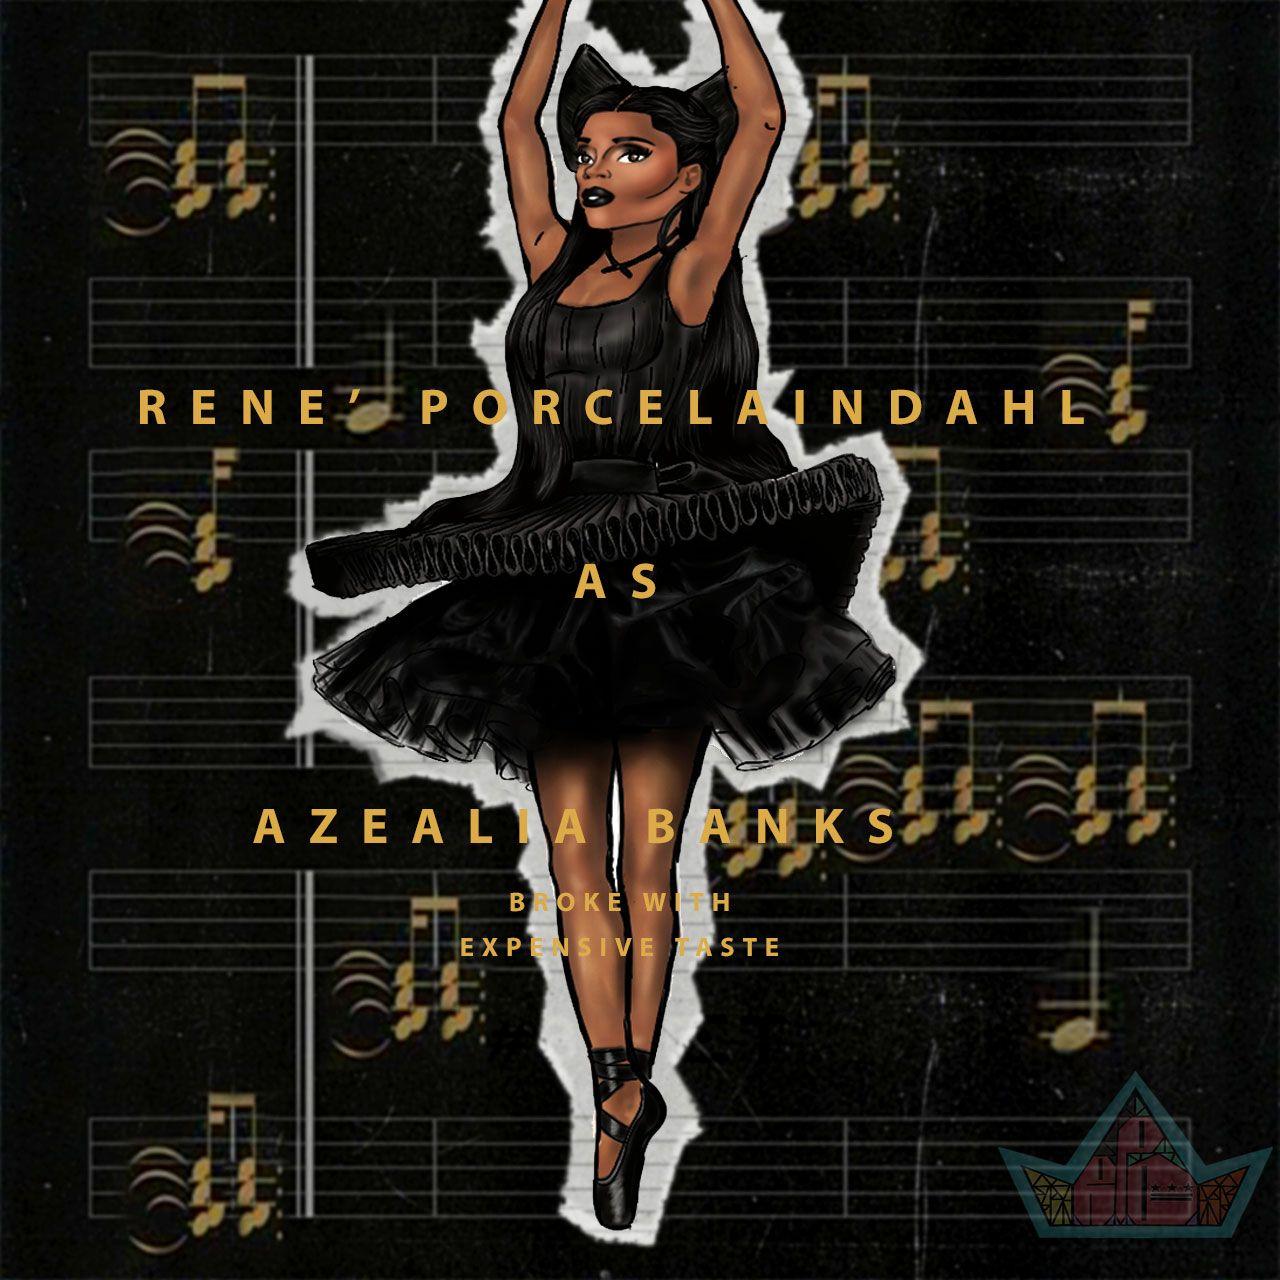 Rene' PorcelainDahl as Azealia Banks